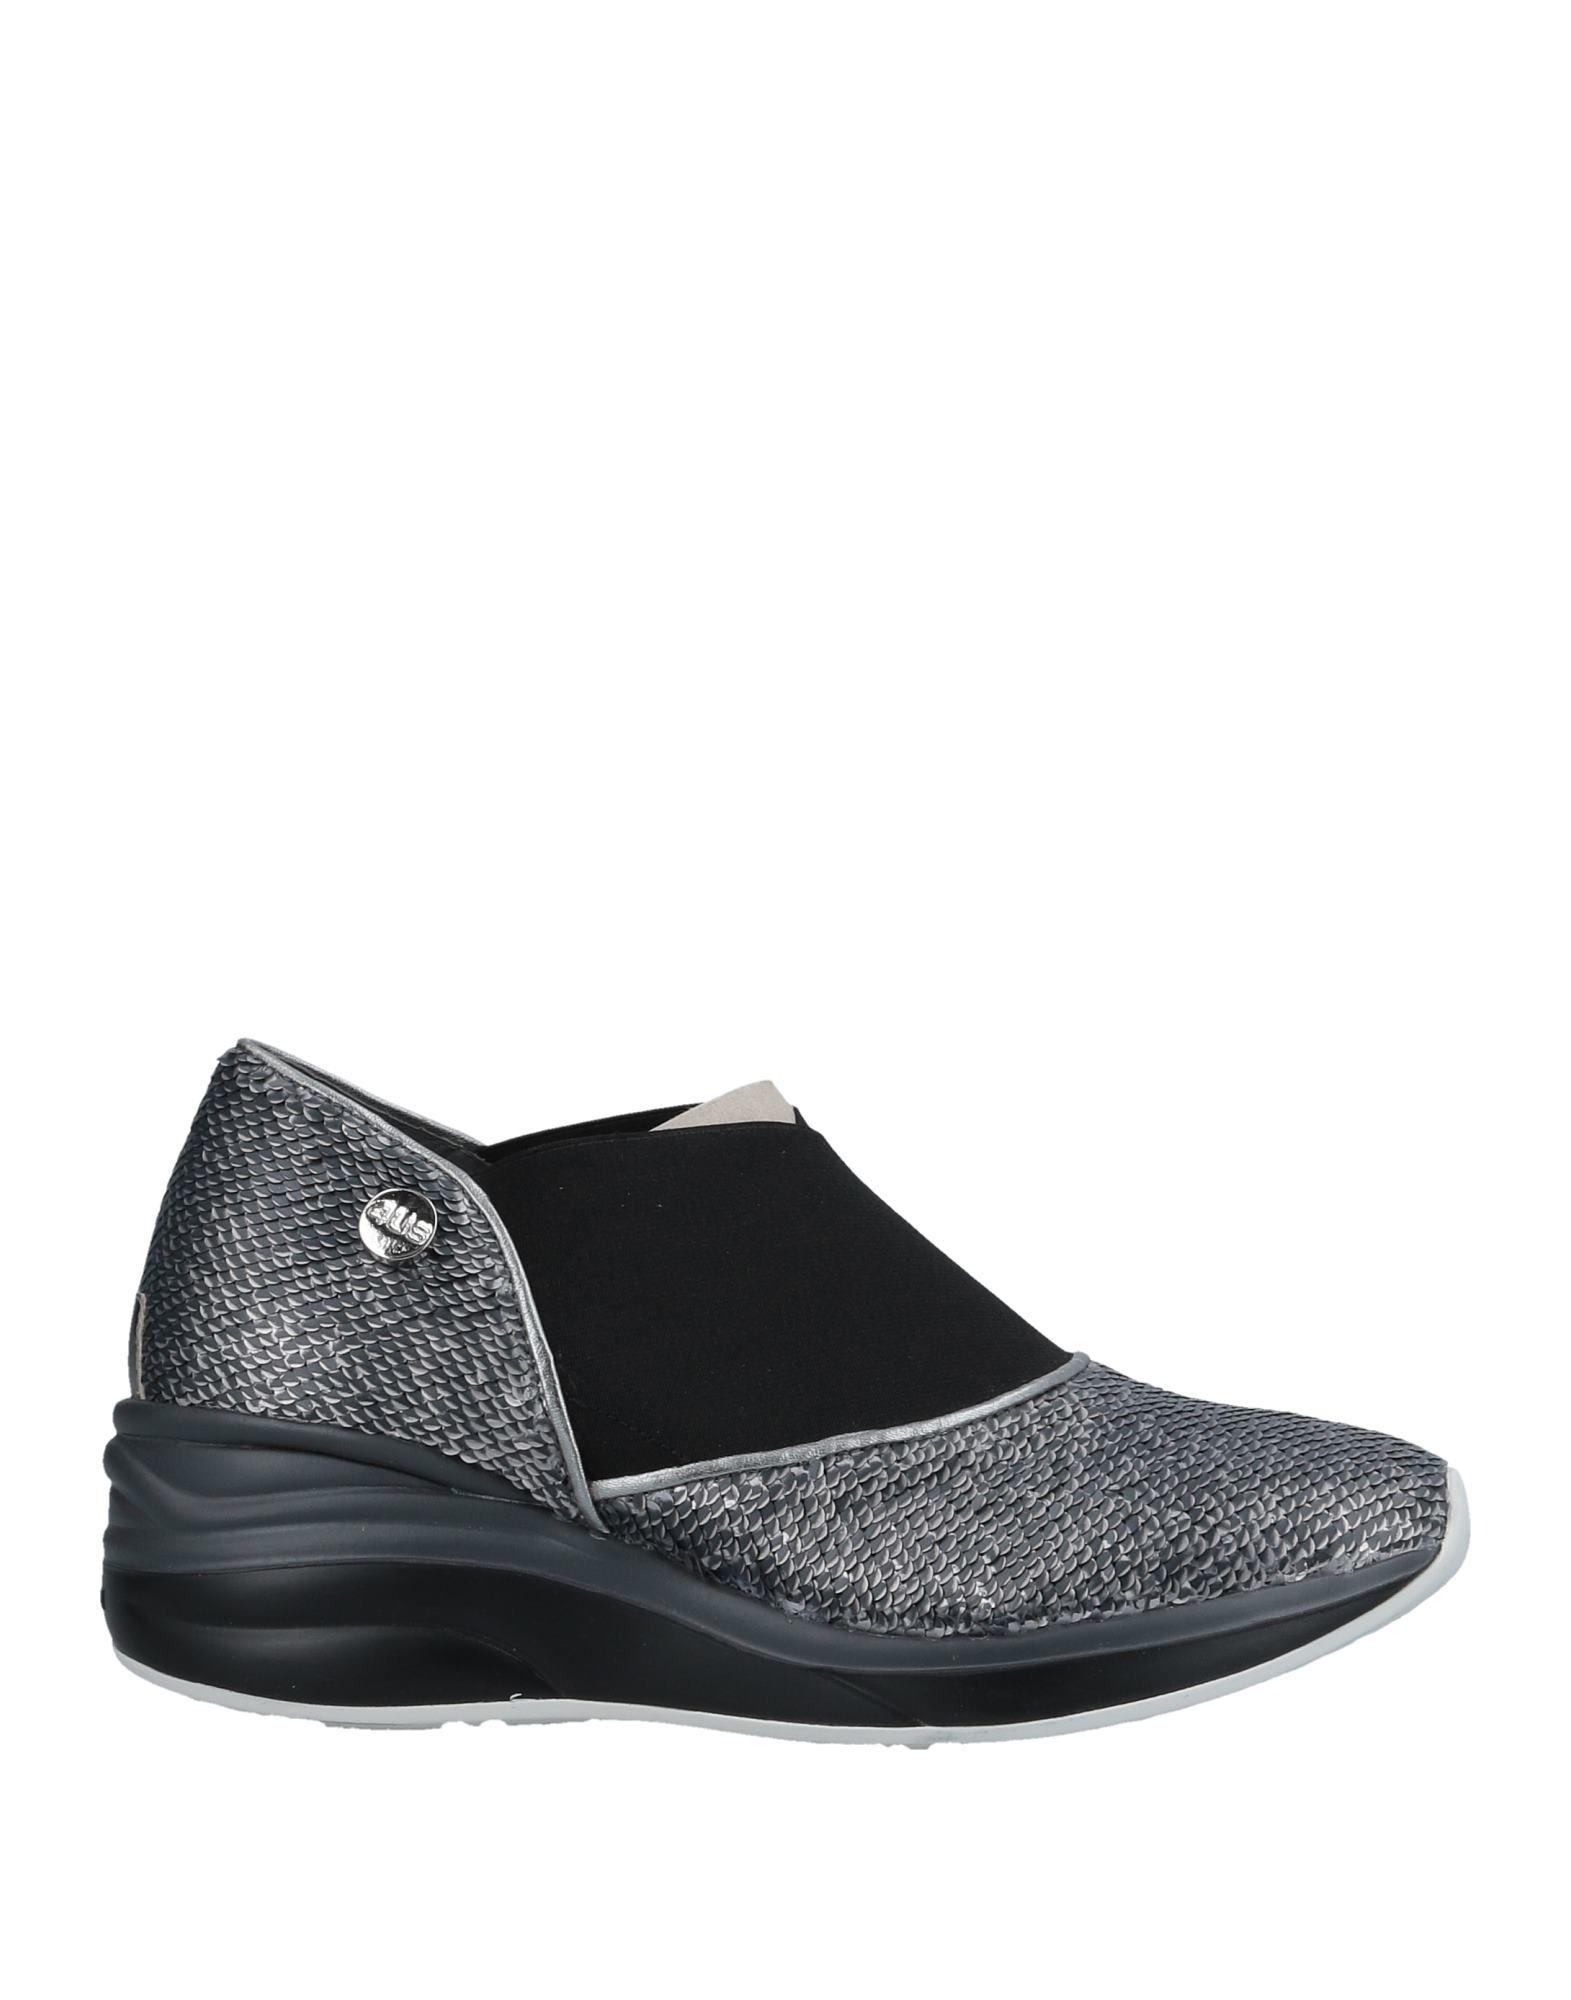 Cesare Paciotti 4Us Sneakers Damen  11509372RBGut aussehende strapazierfähige Schuhe